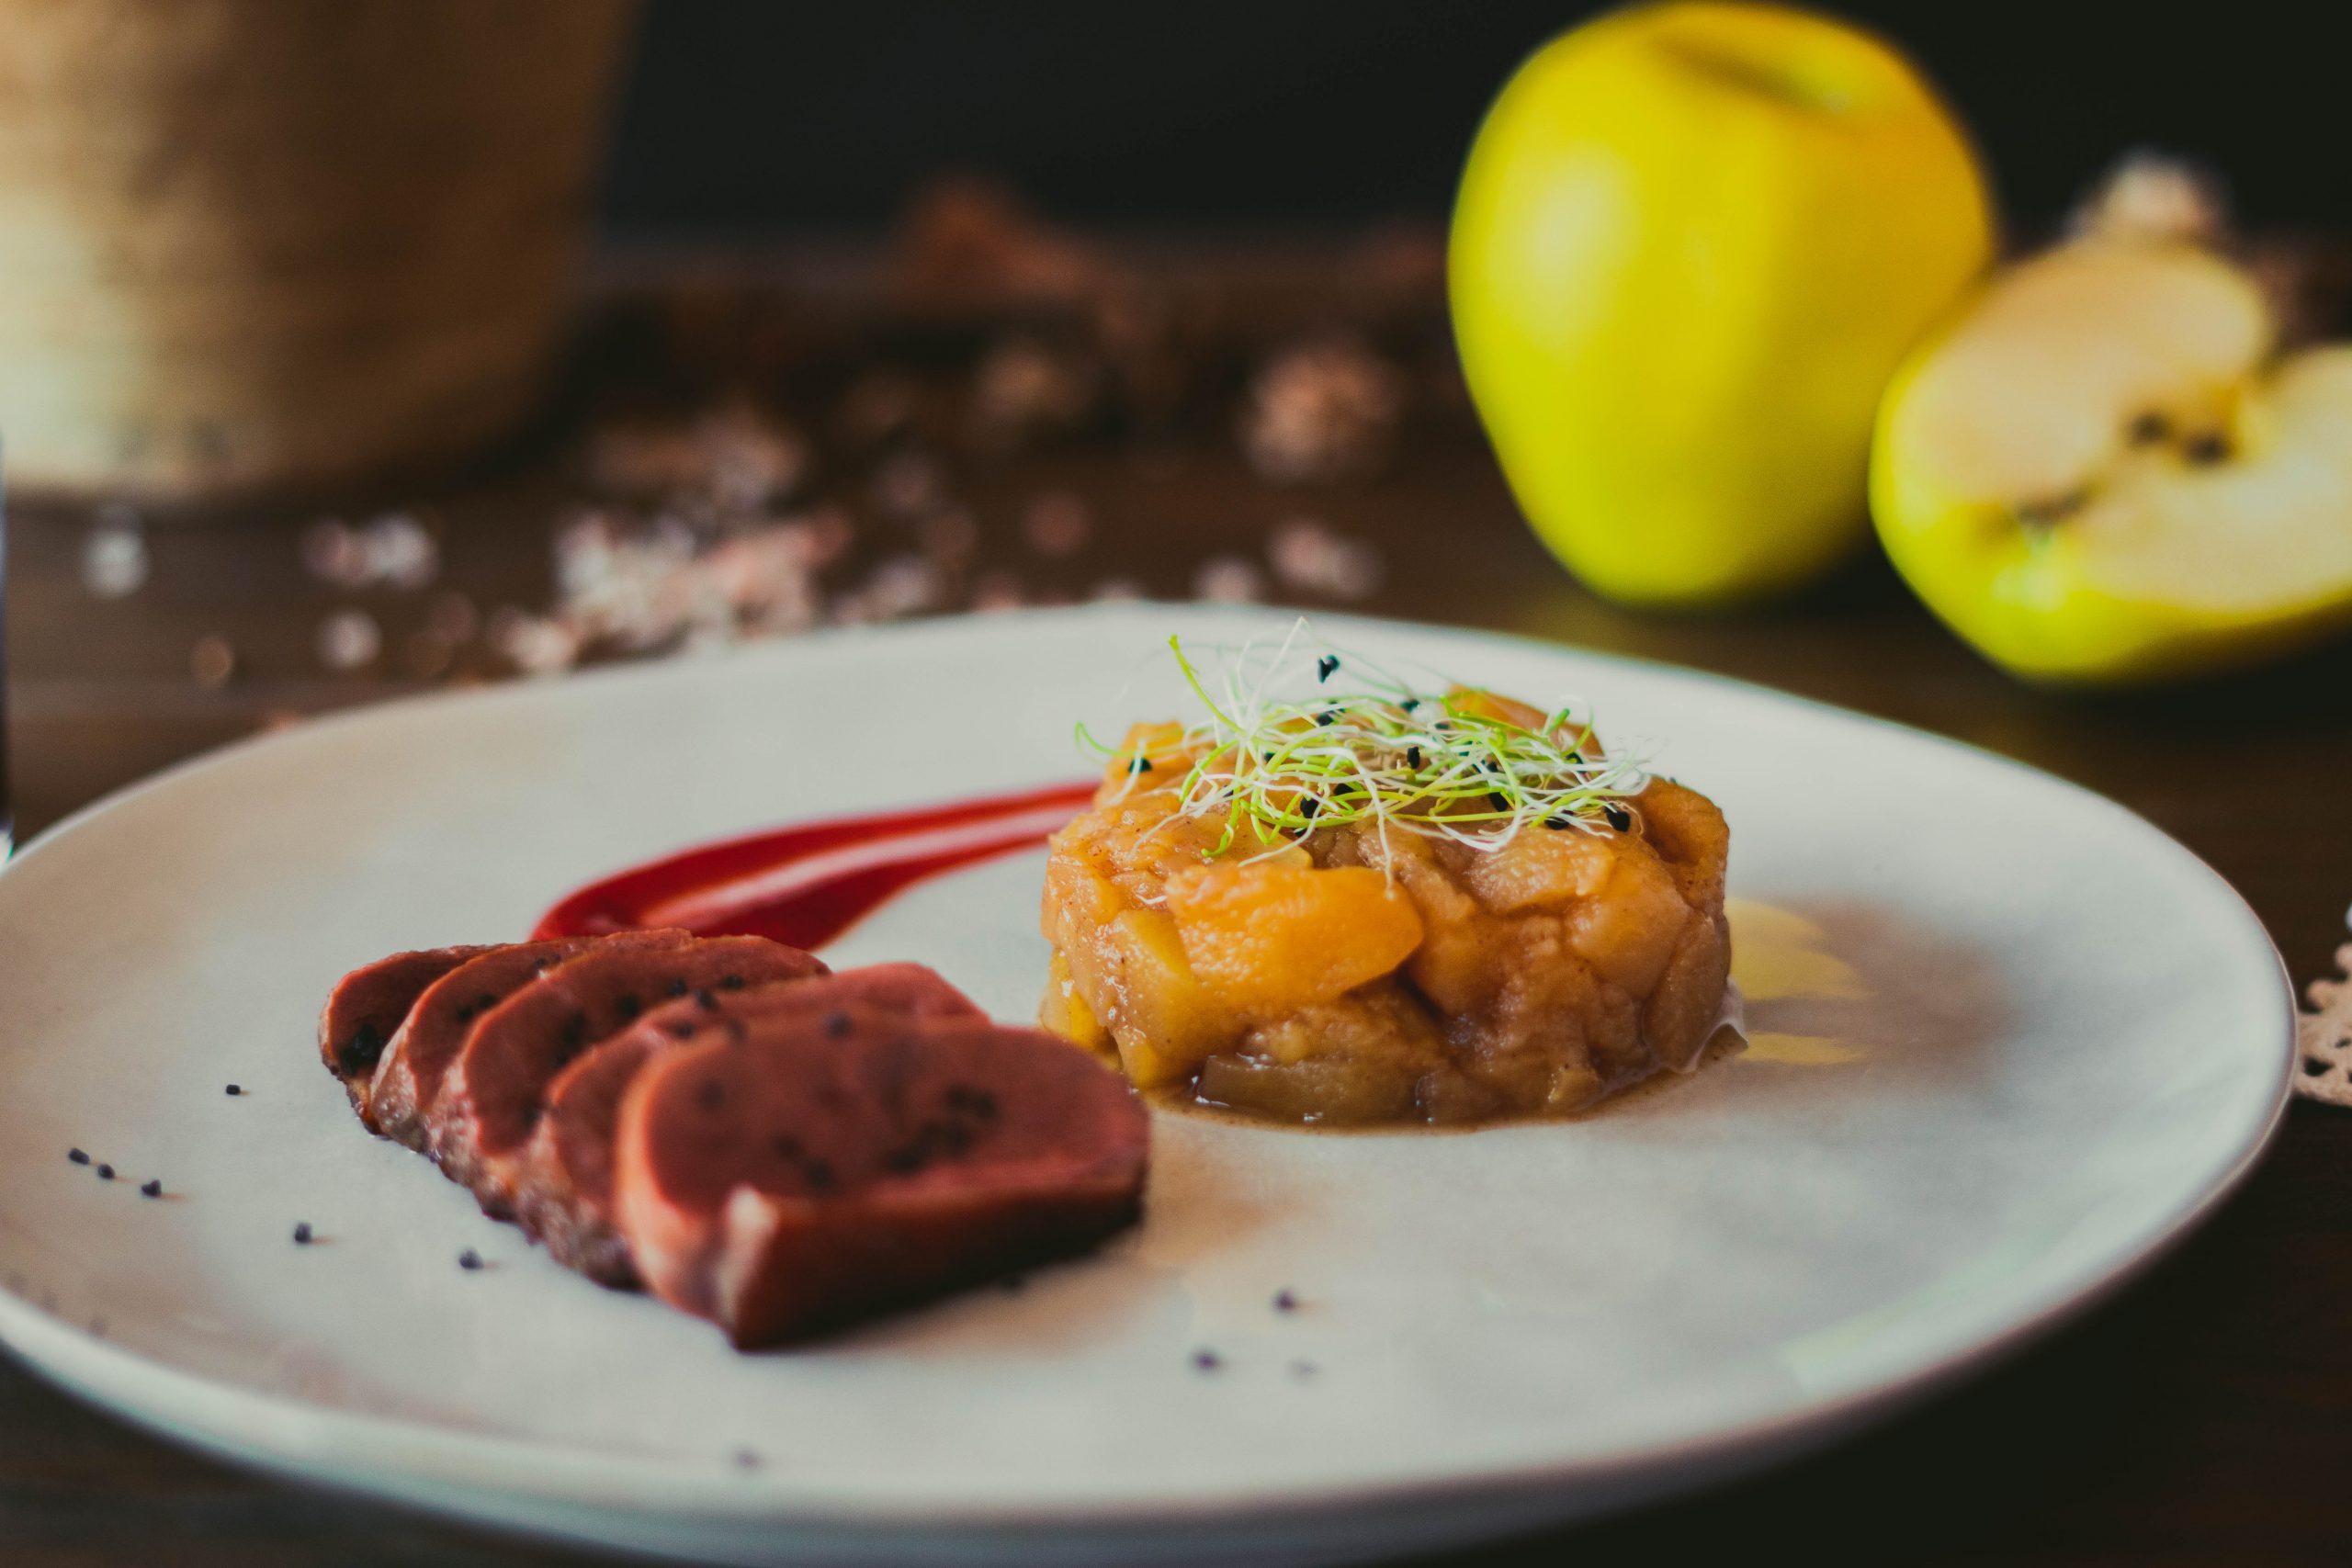 Menú Komorís - Magret de pato - Komo, cocina gourmet en tu casa